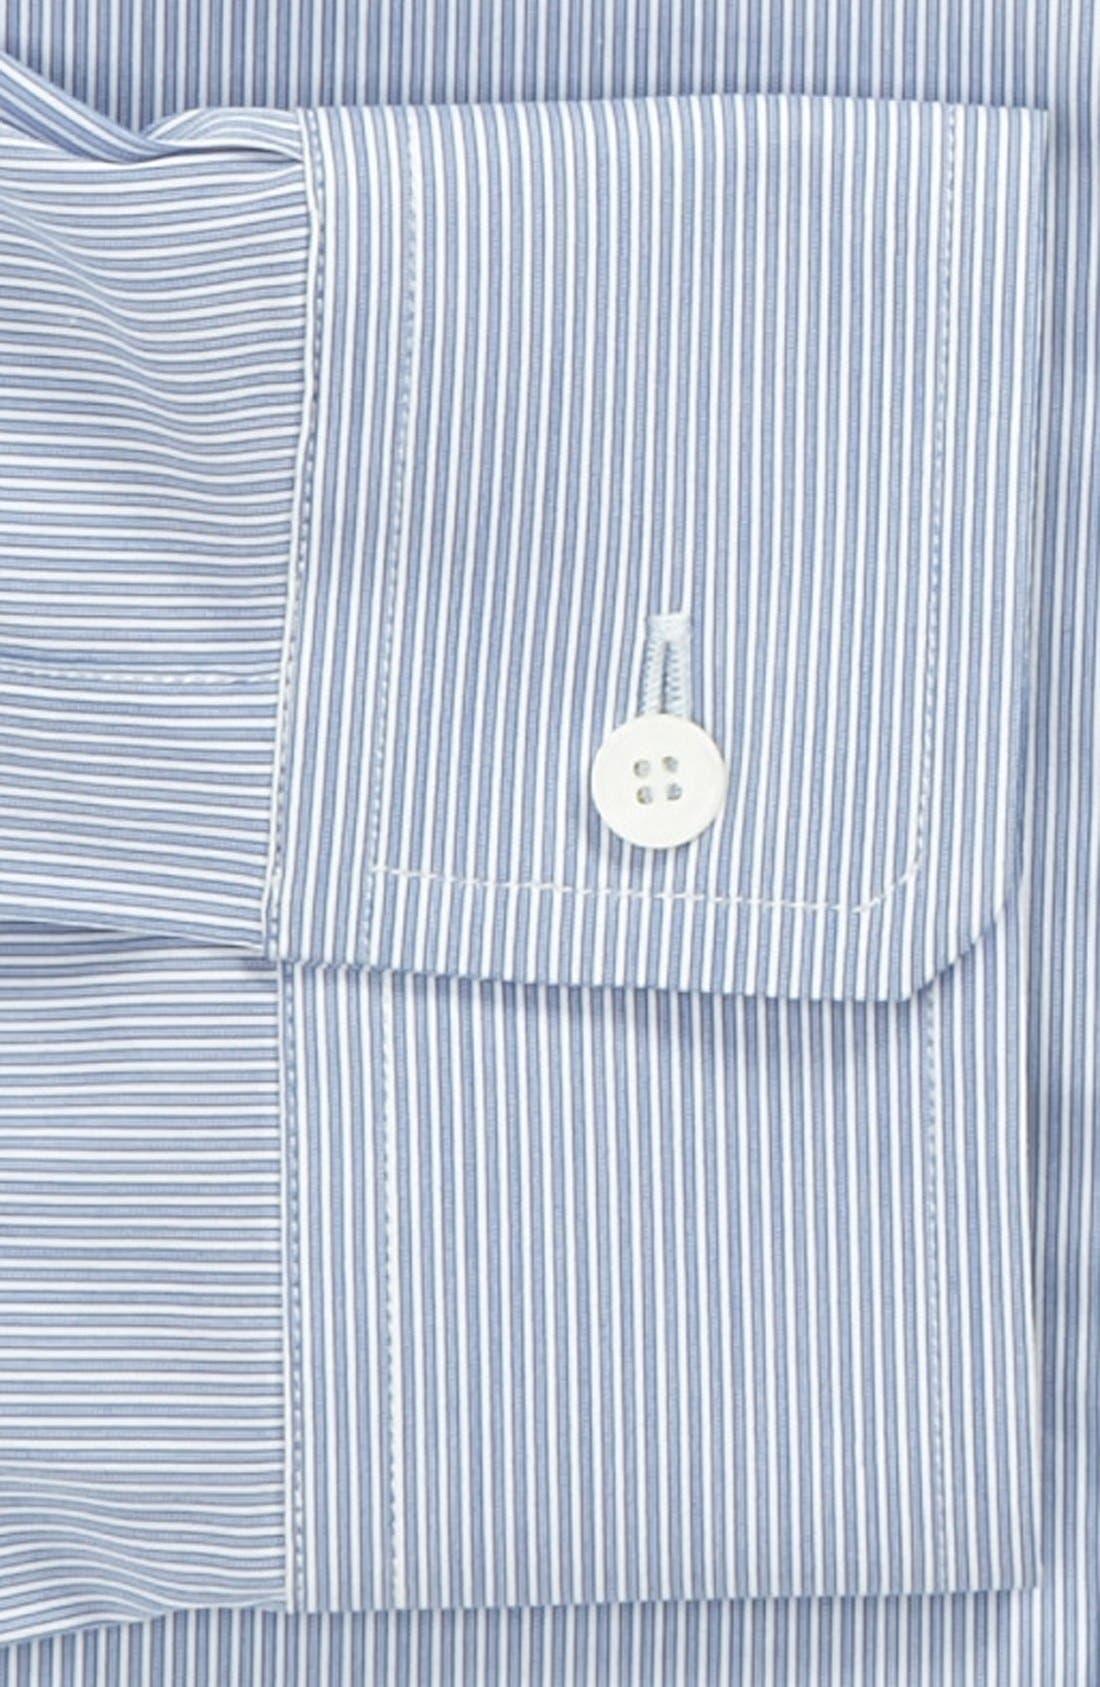 BURBERRY,                             London Stripe Tailored Fit Dress Shirt,                             Alternate thumbnail 2, color,                             426